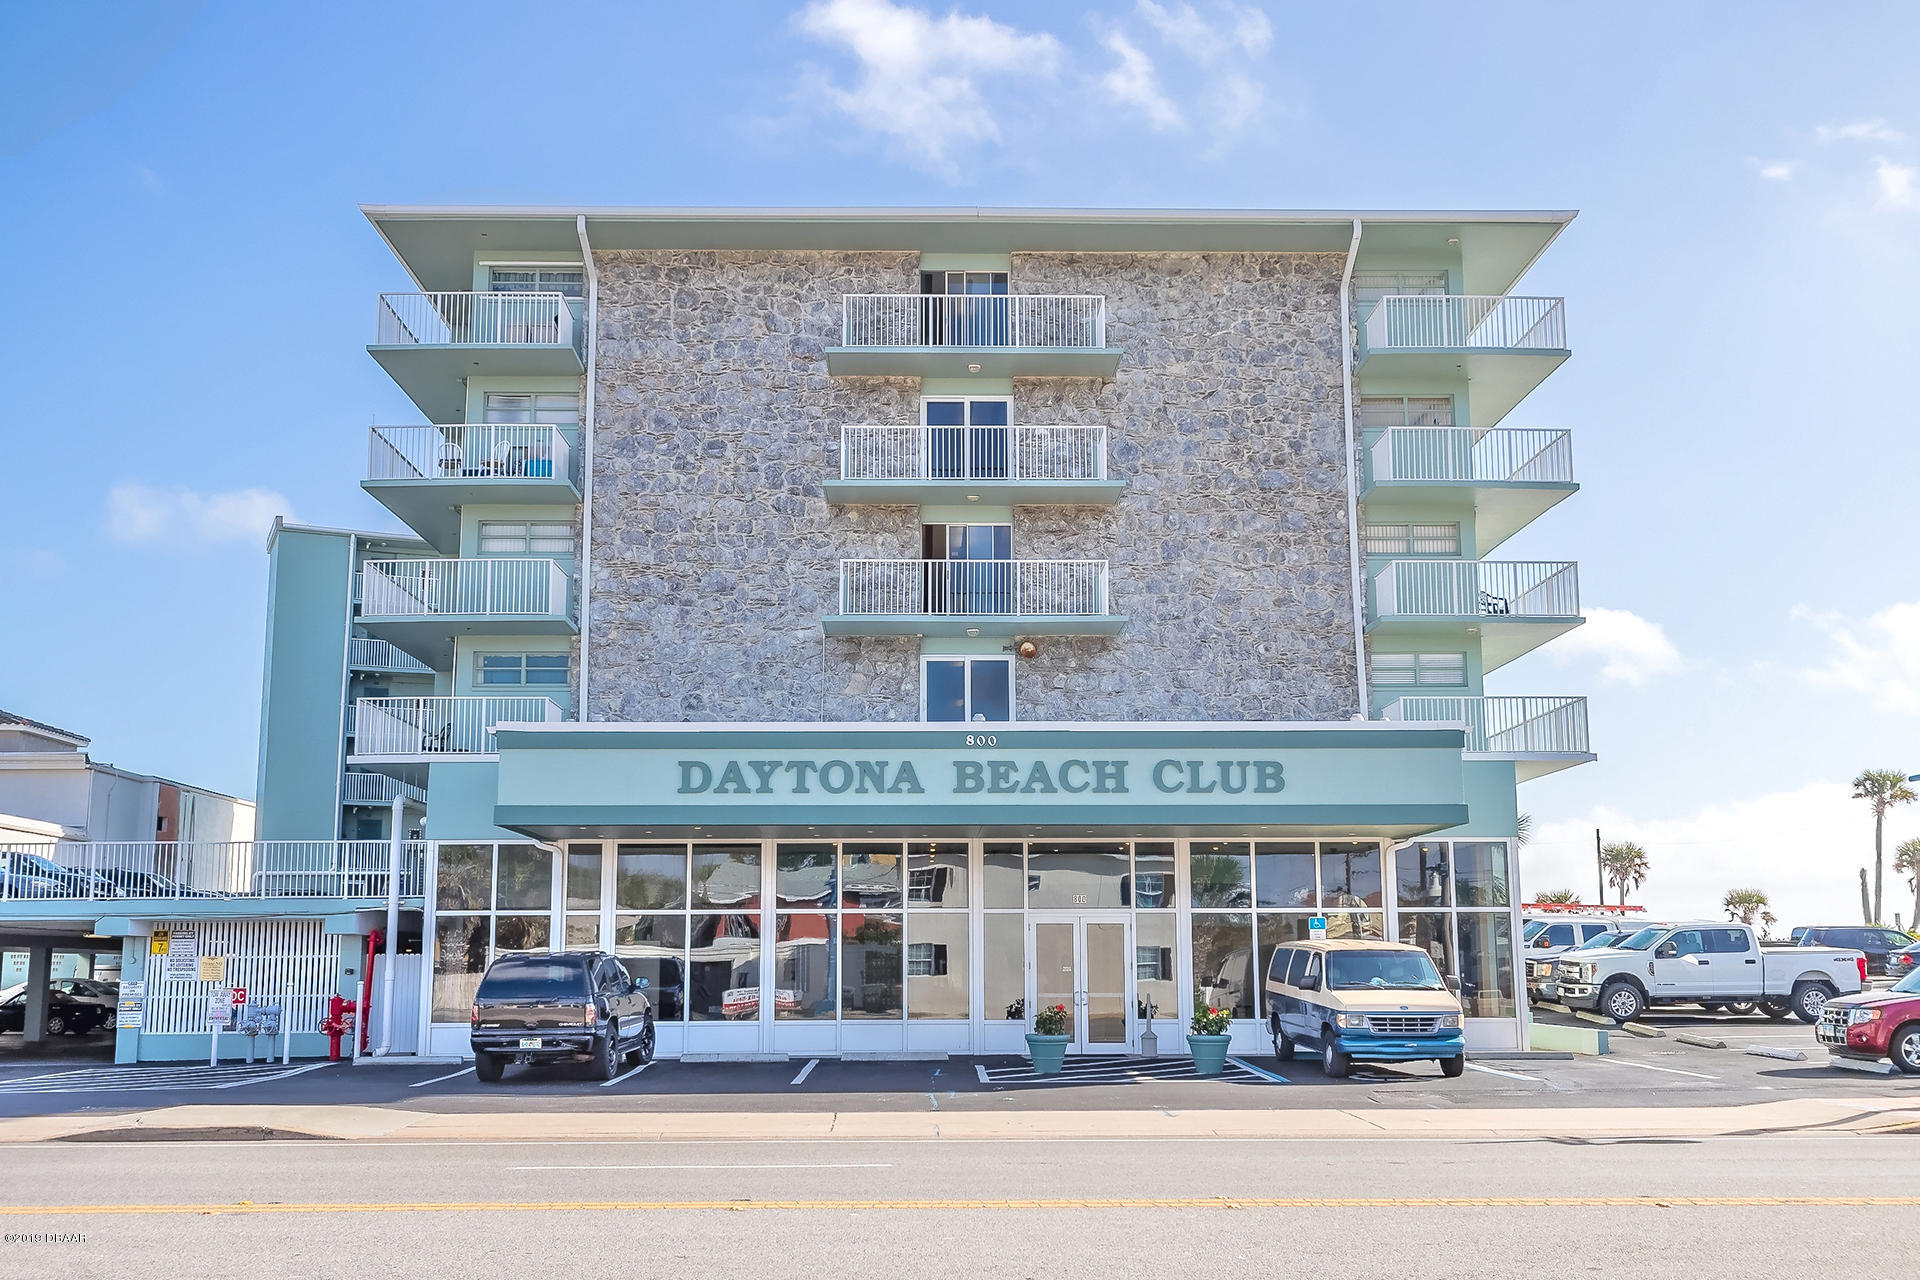 800 N Atlantic Avenue, Daytona Beach, Florida